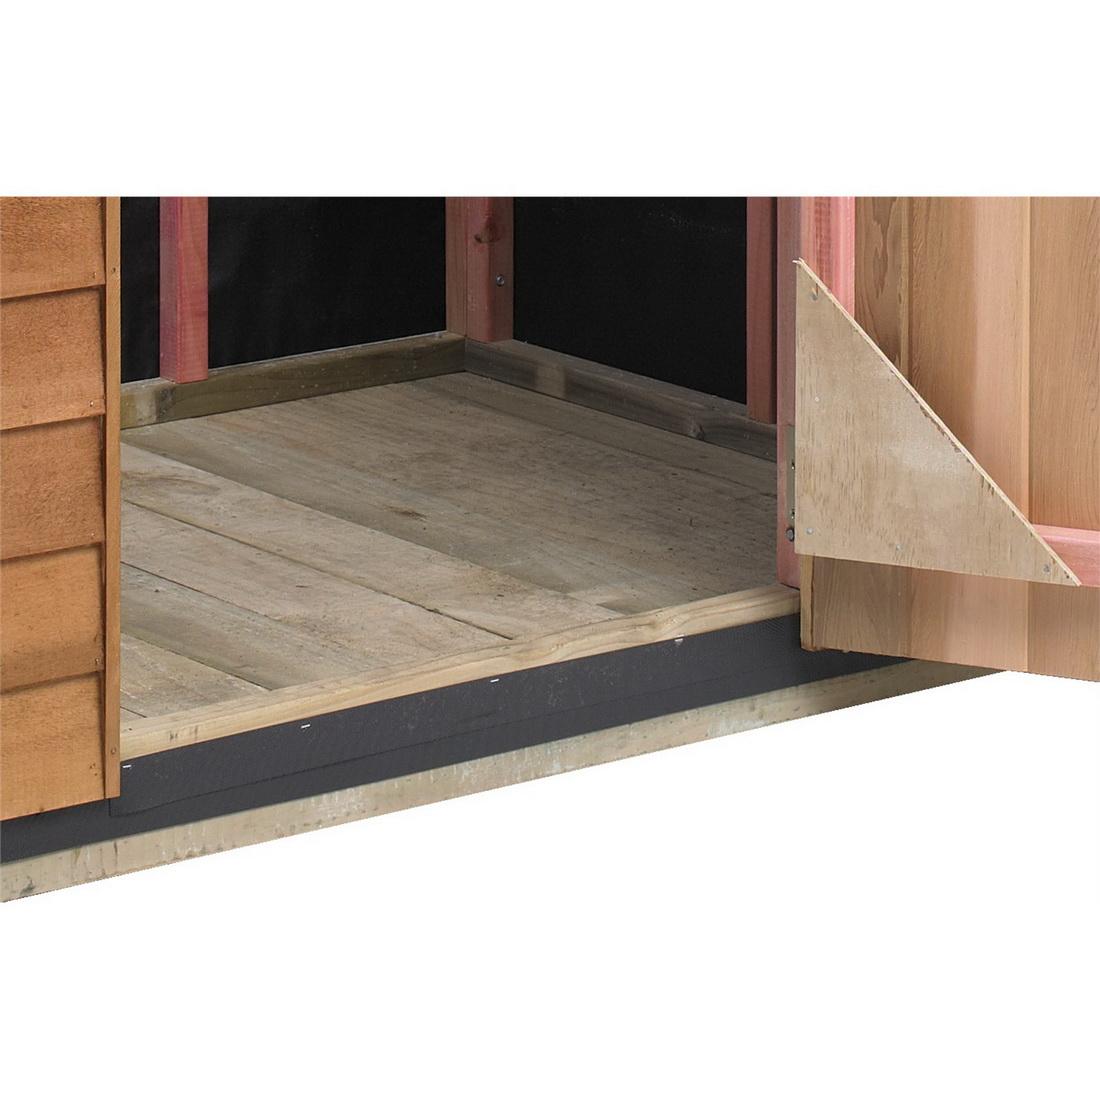 Astor Garden Shed Timber Floor Kit